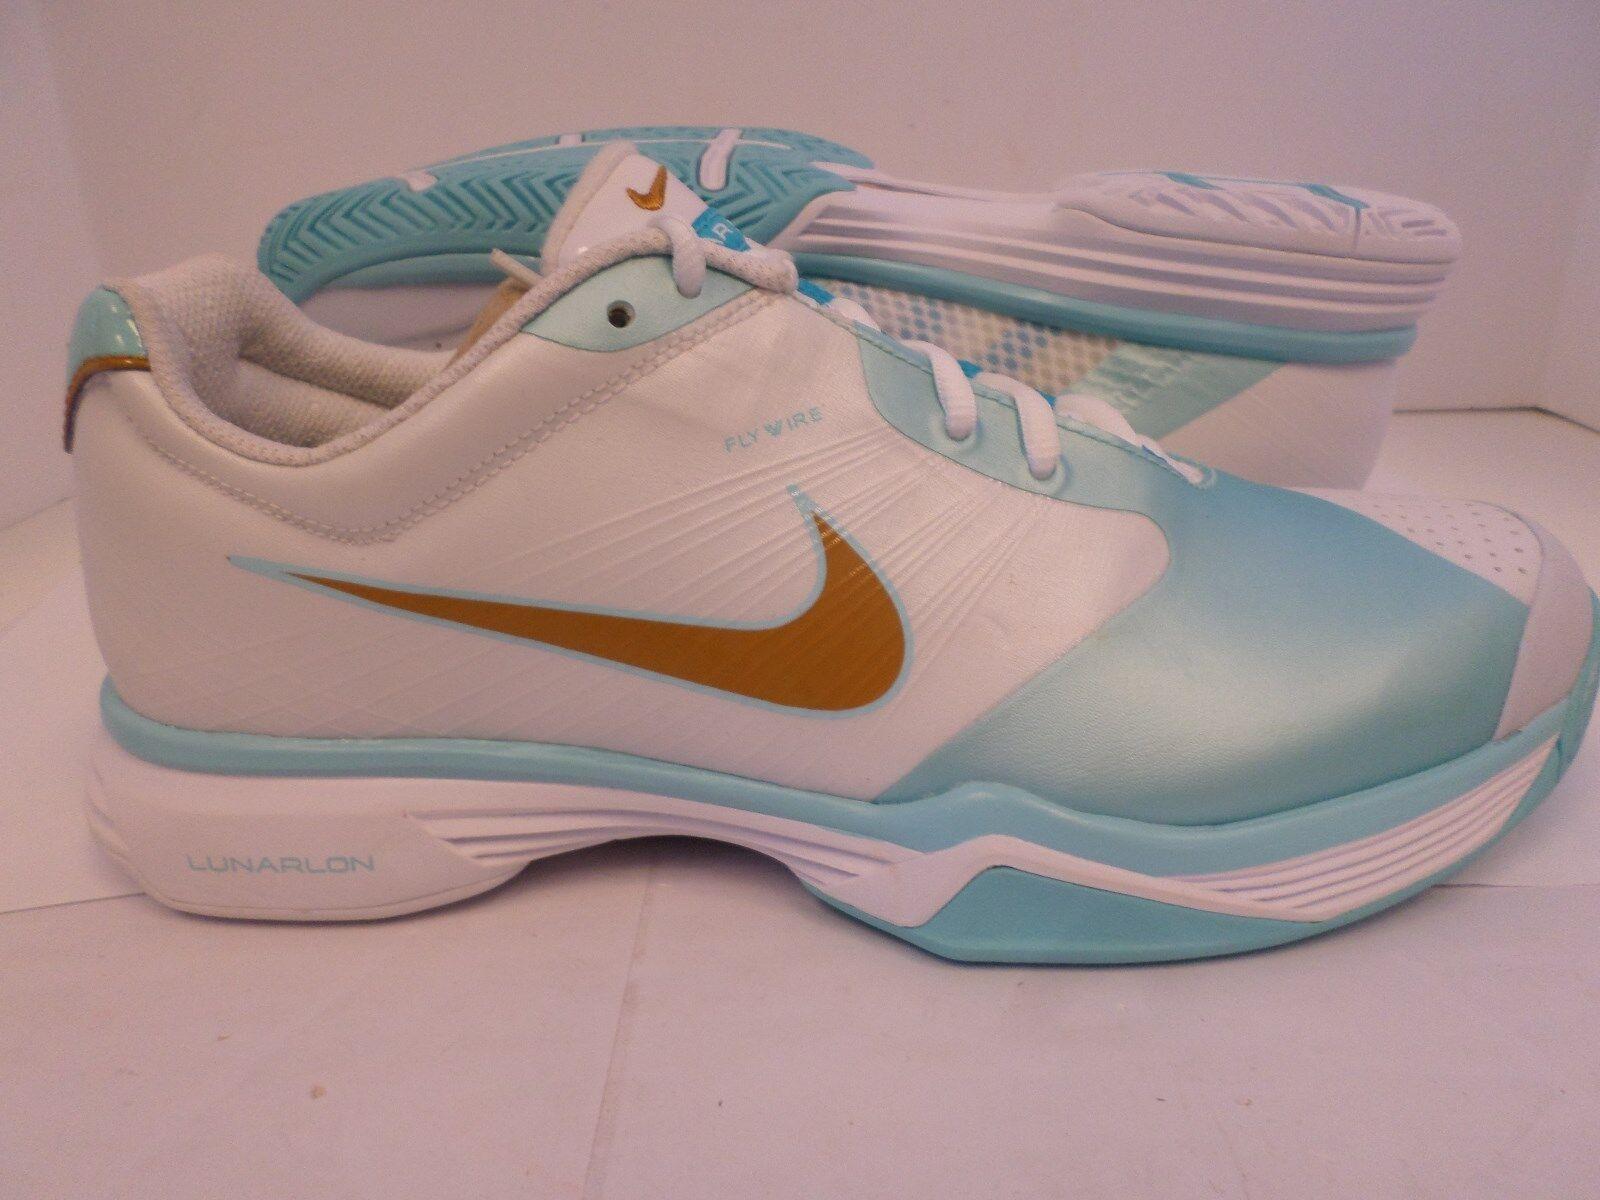 New Nike Women's Lunar Speed 3 Tennis Shoes White/Light Blue/Gold 429999-102